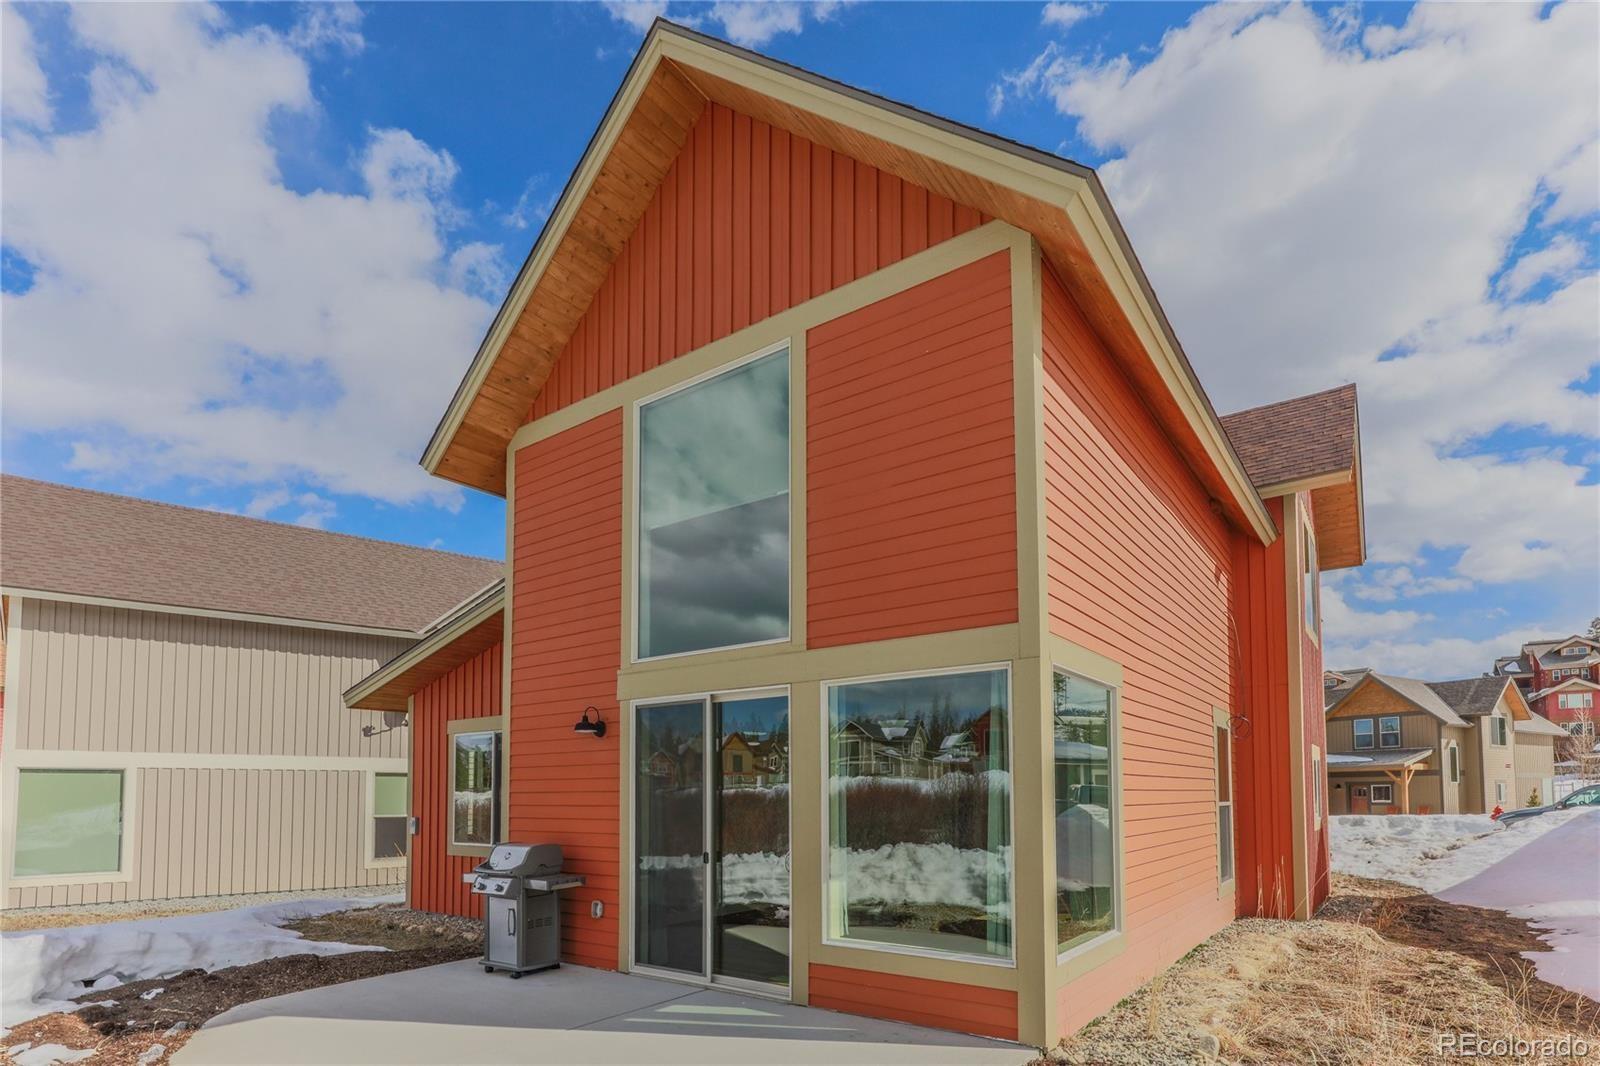 MLS# 4869572 - 5 - 33 Beaver Brook Trail, Fraser, CO 80442